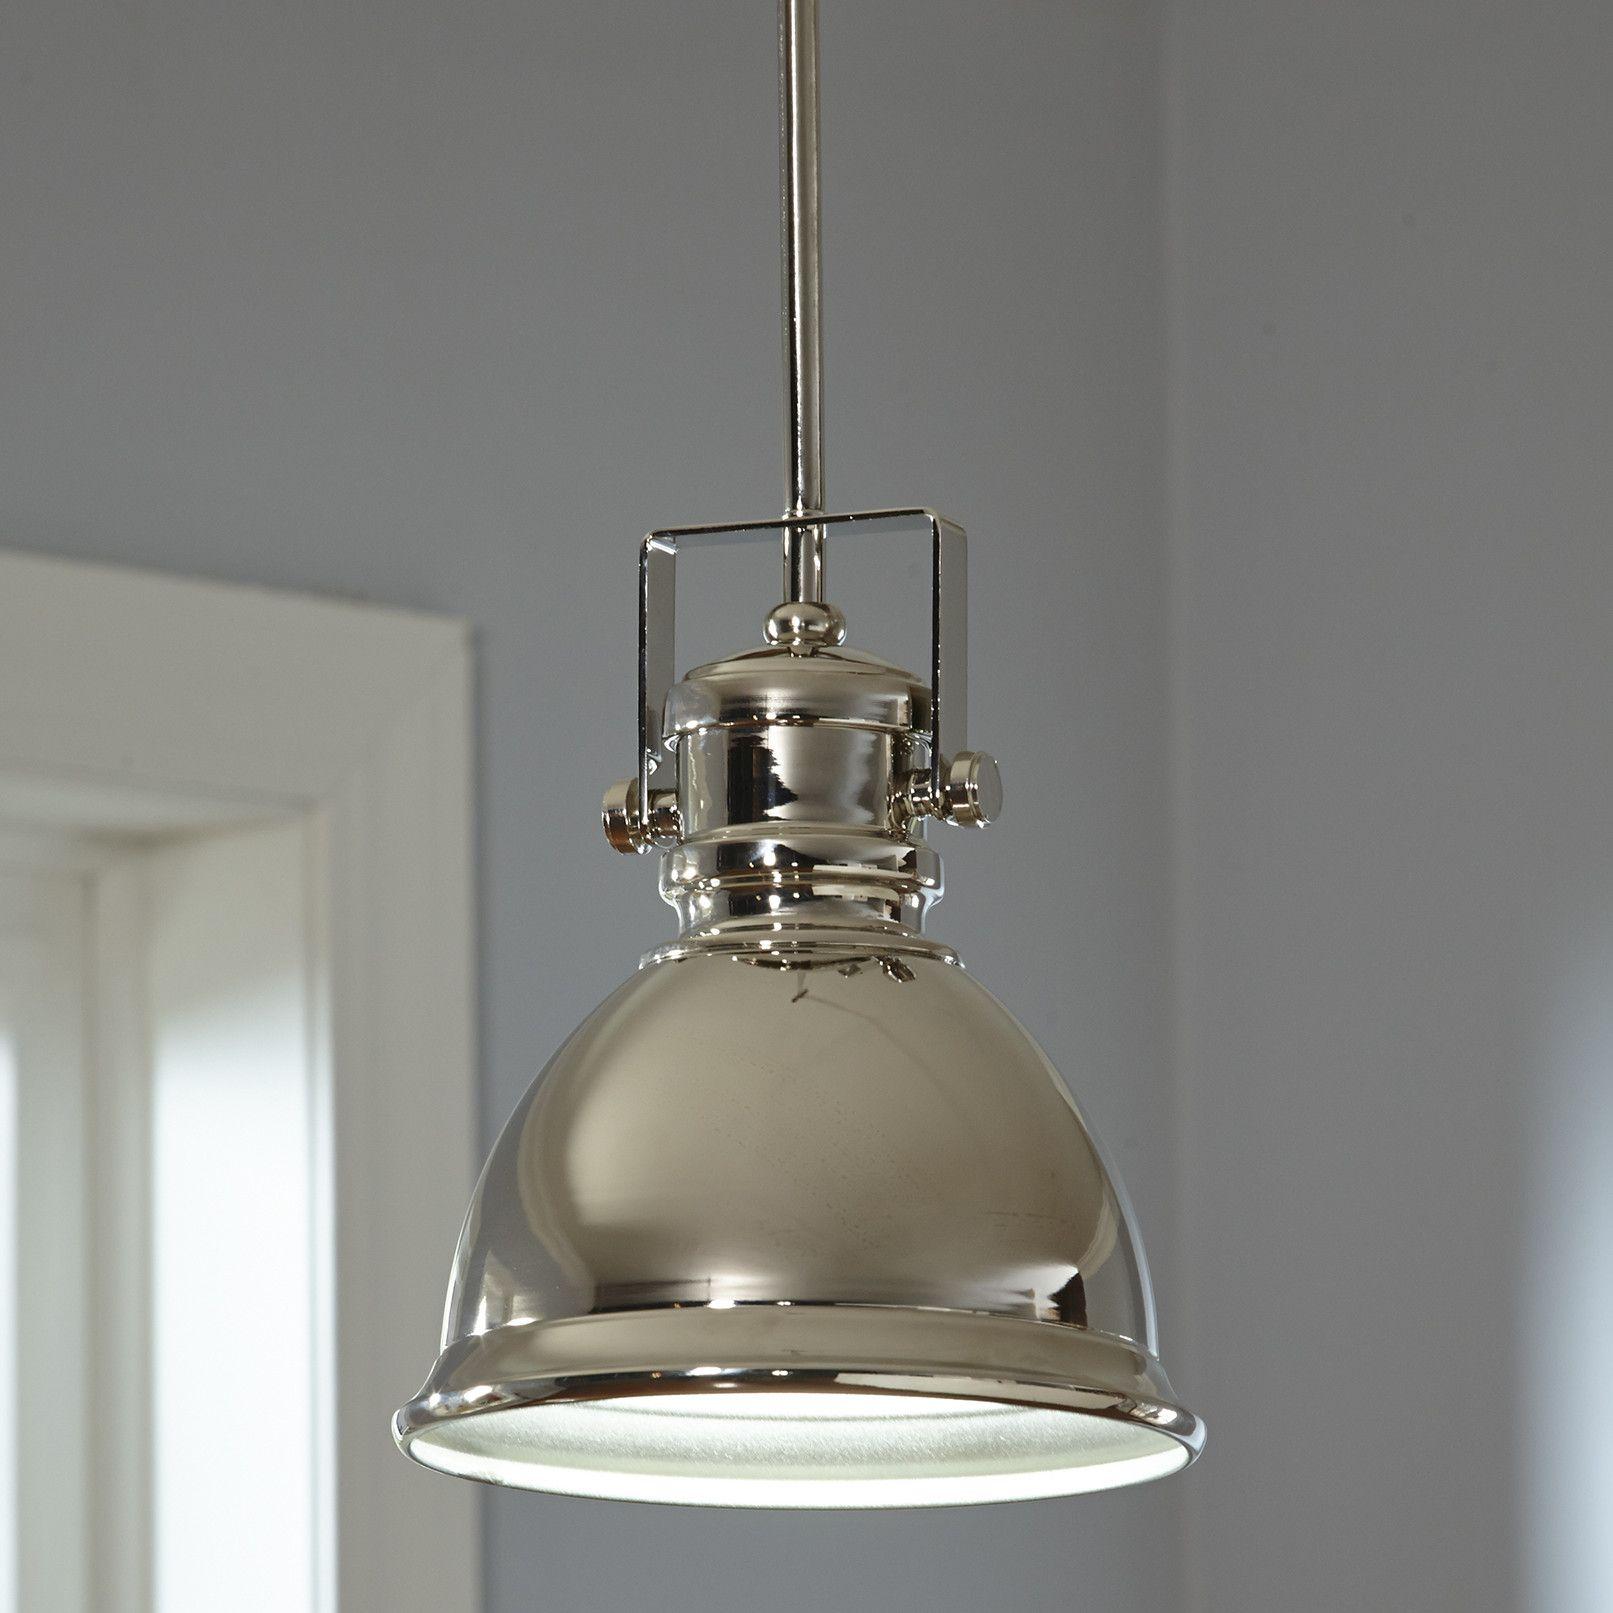 Condo Kitchen Lighting Ideas: Rhodes 1-Light Cone Pendant